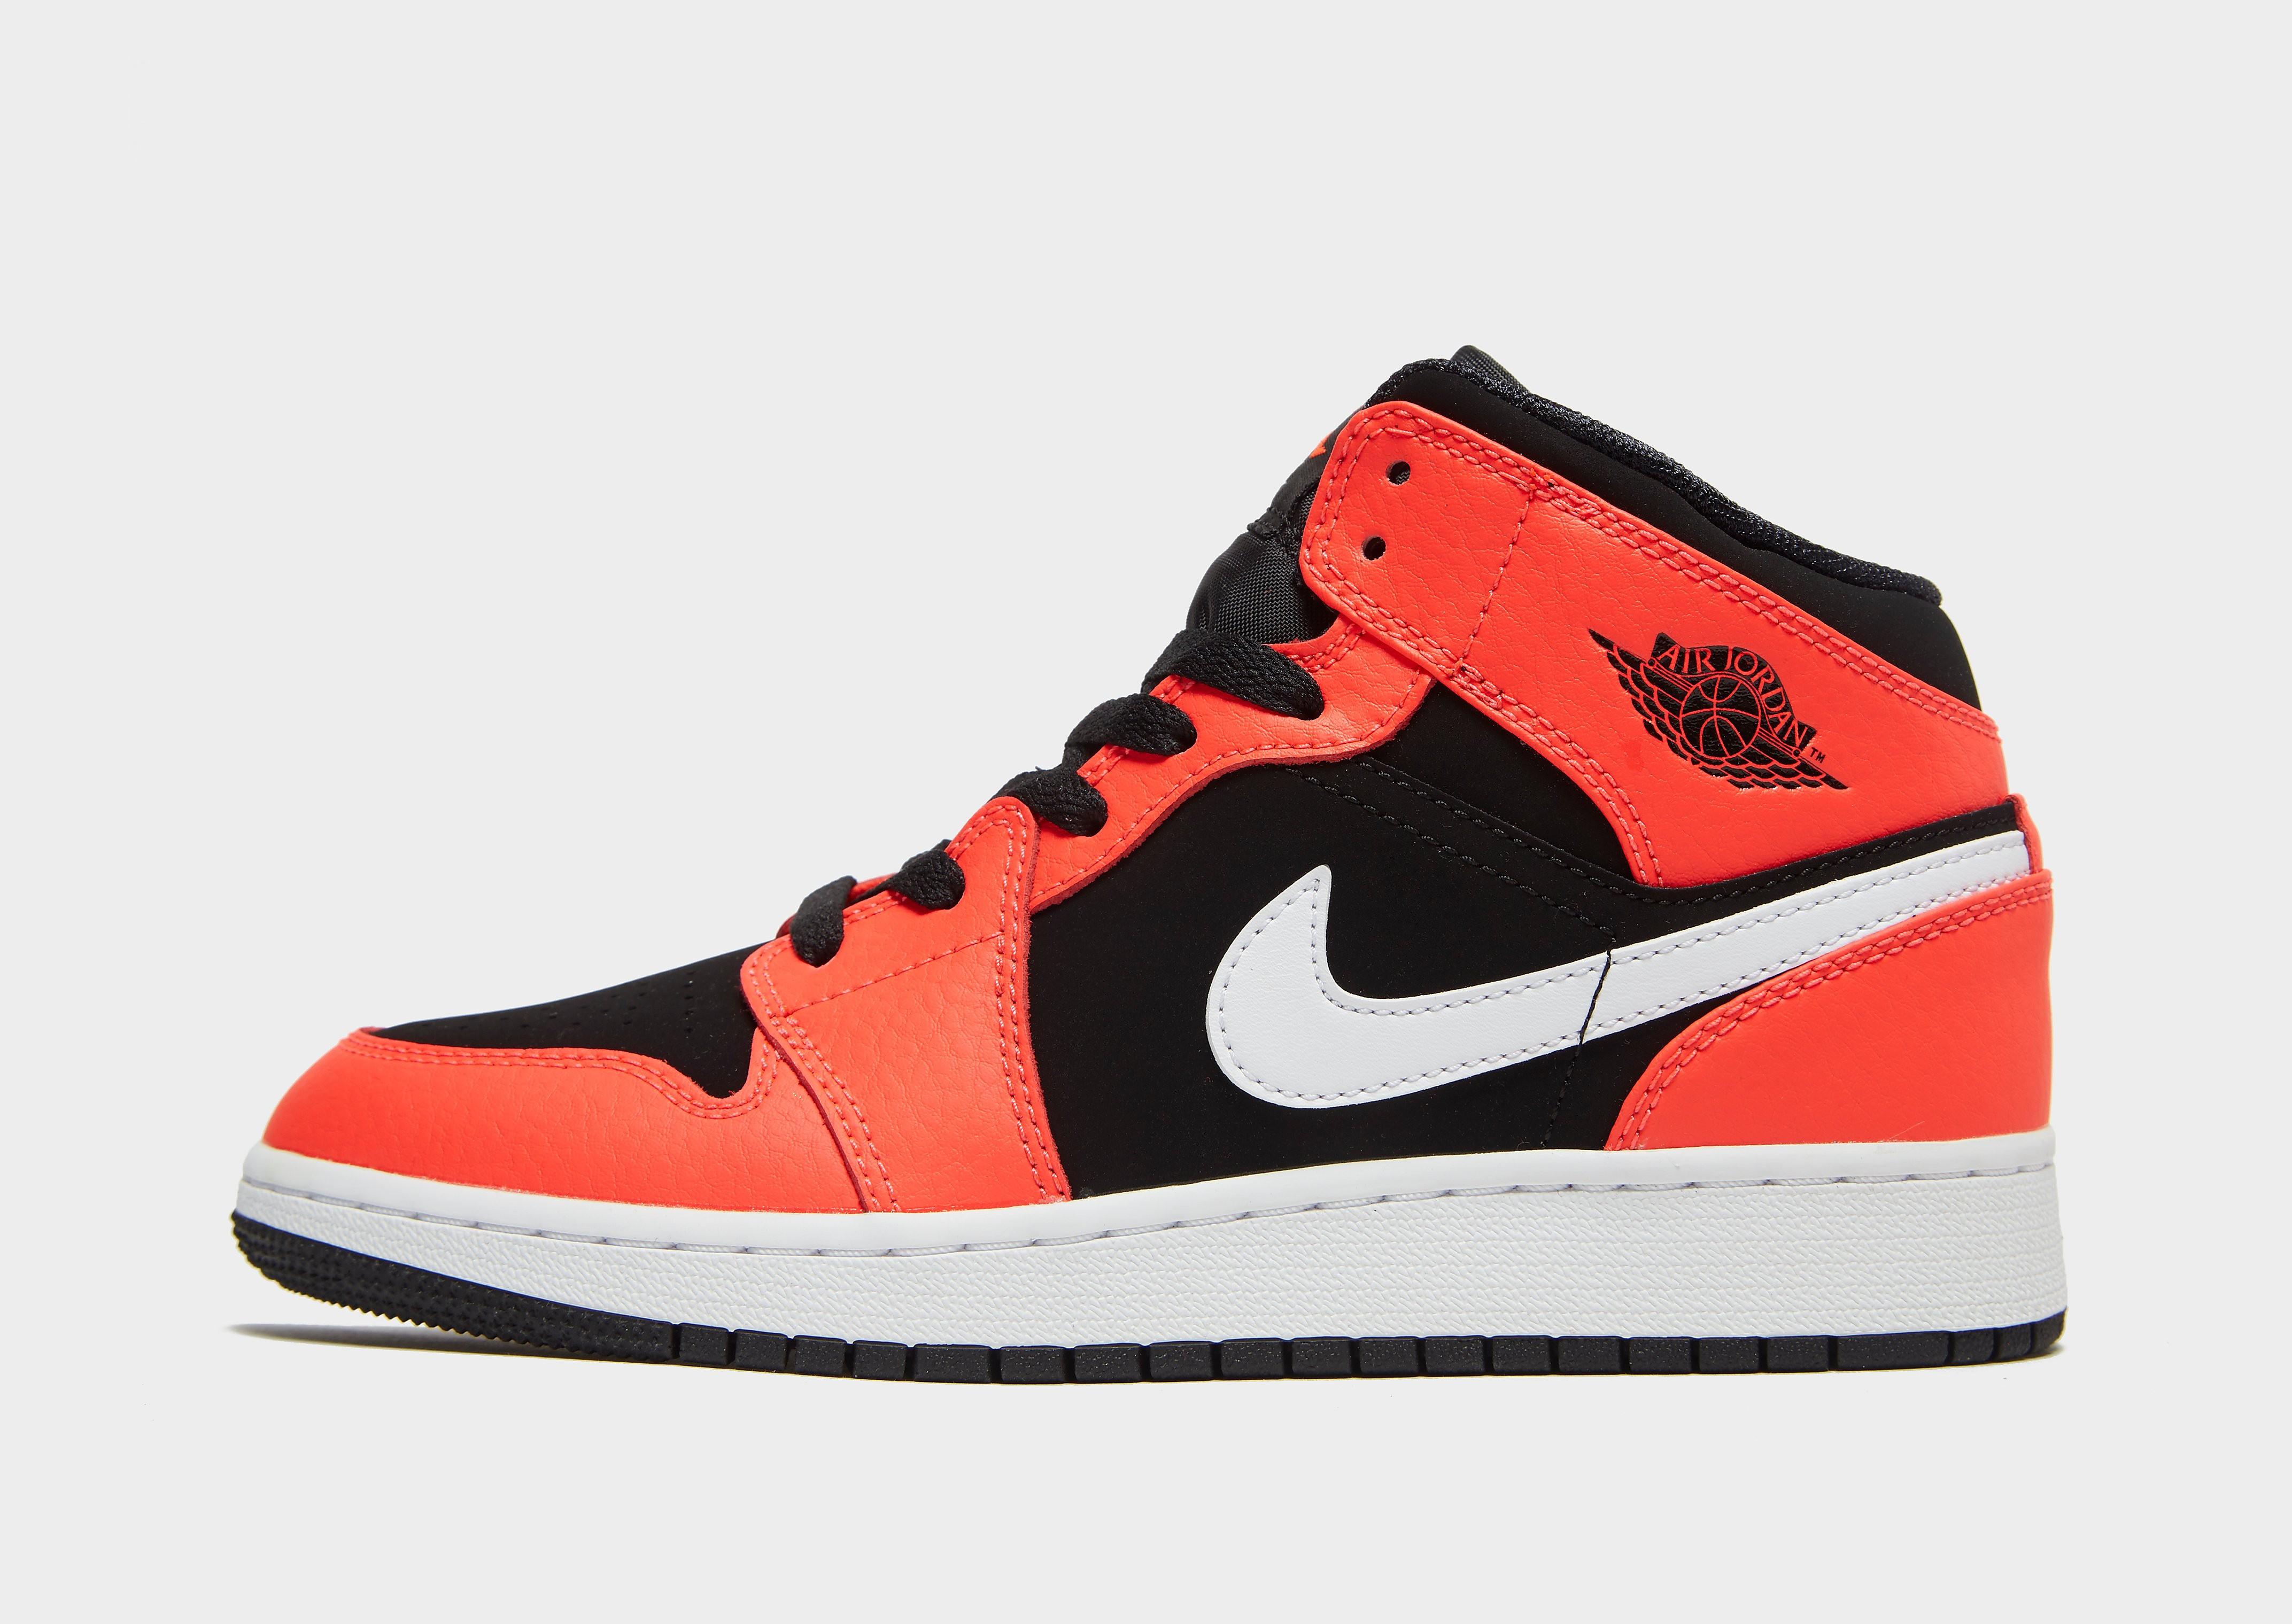 Jordan kindersneaker zwart en rood